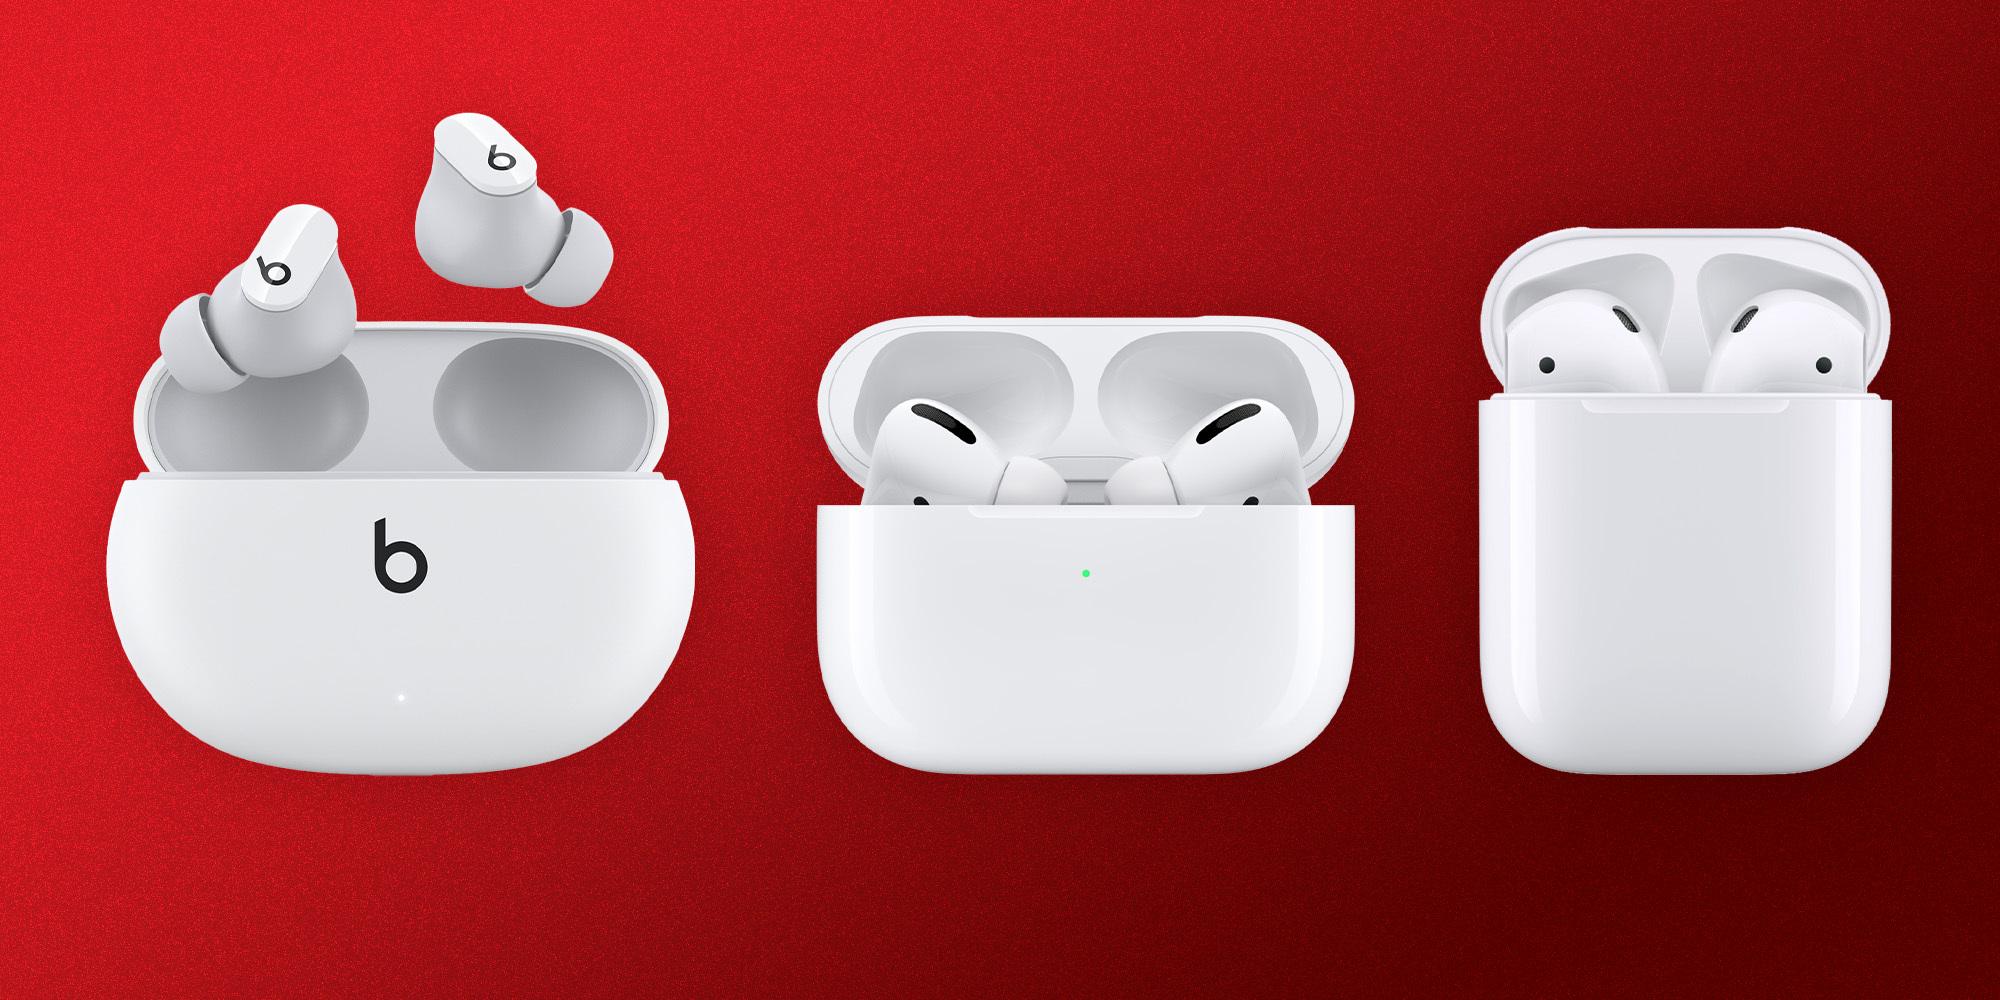 So sánh bộ 3 tai nghe true wireless của Apple